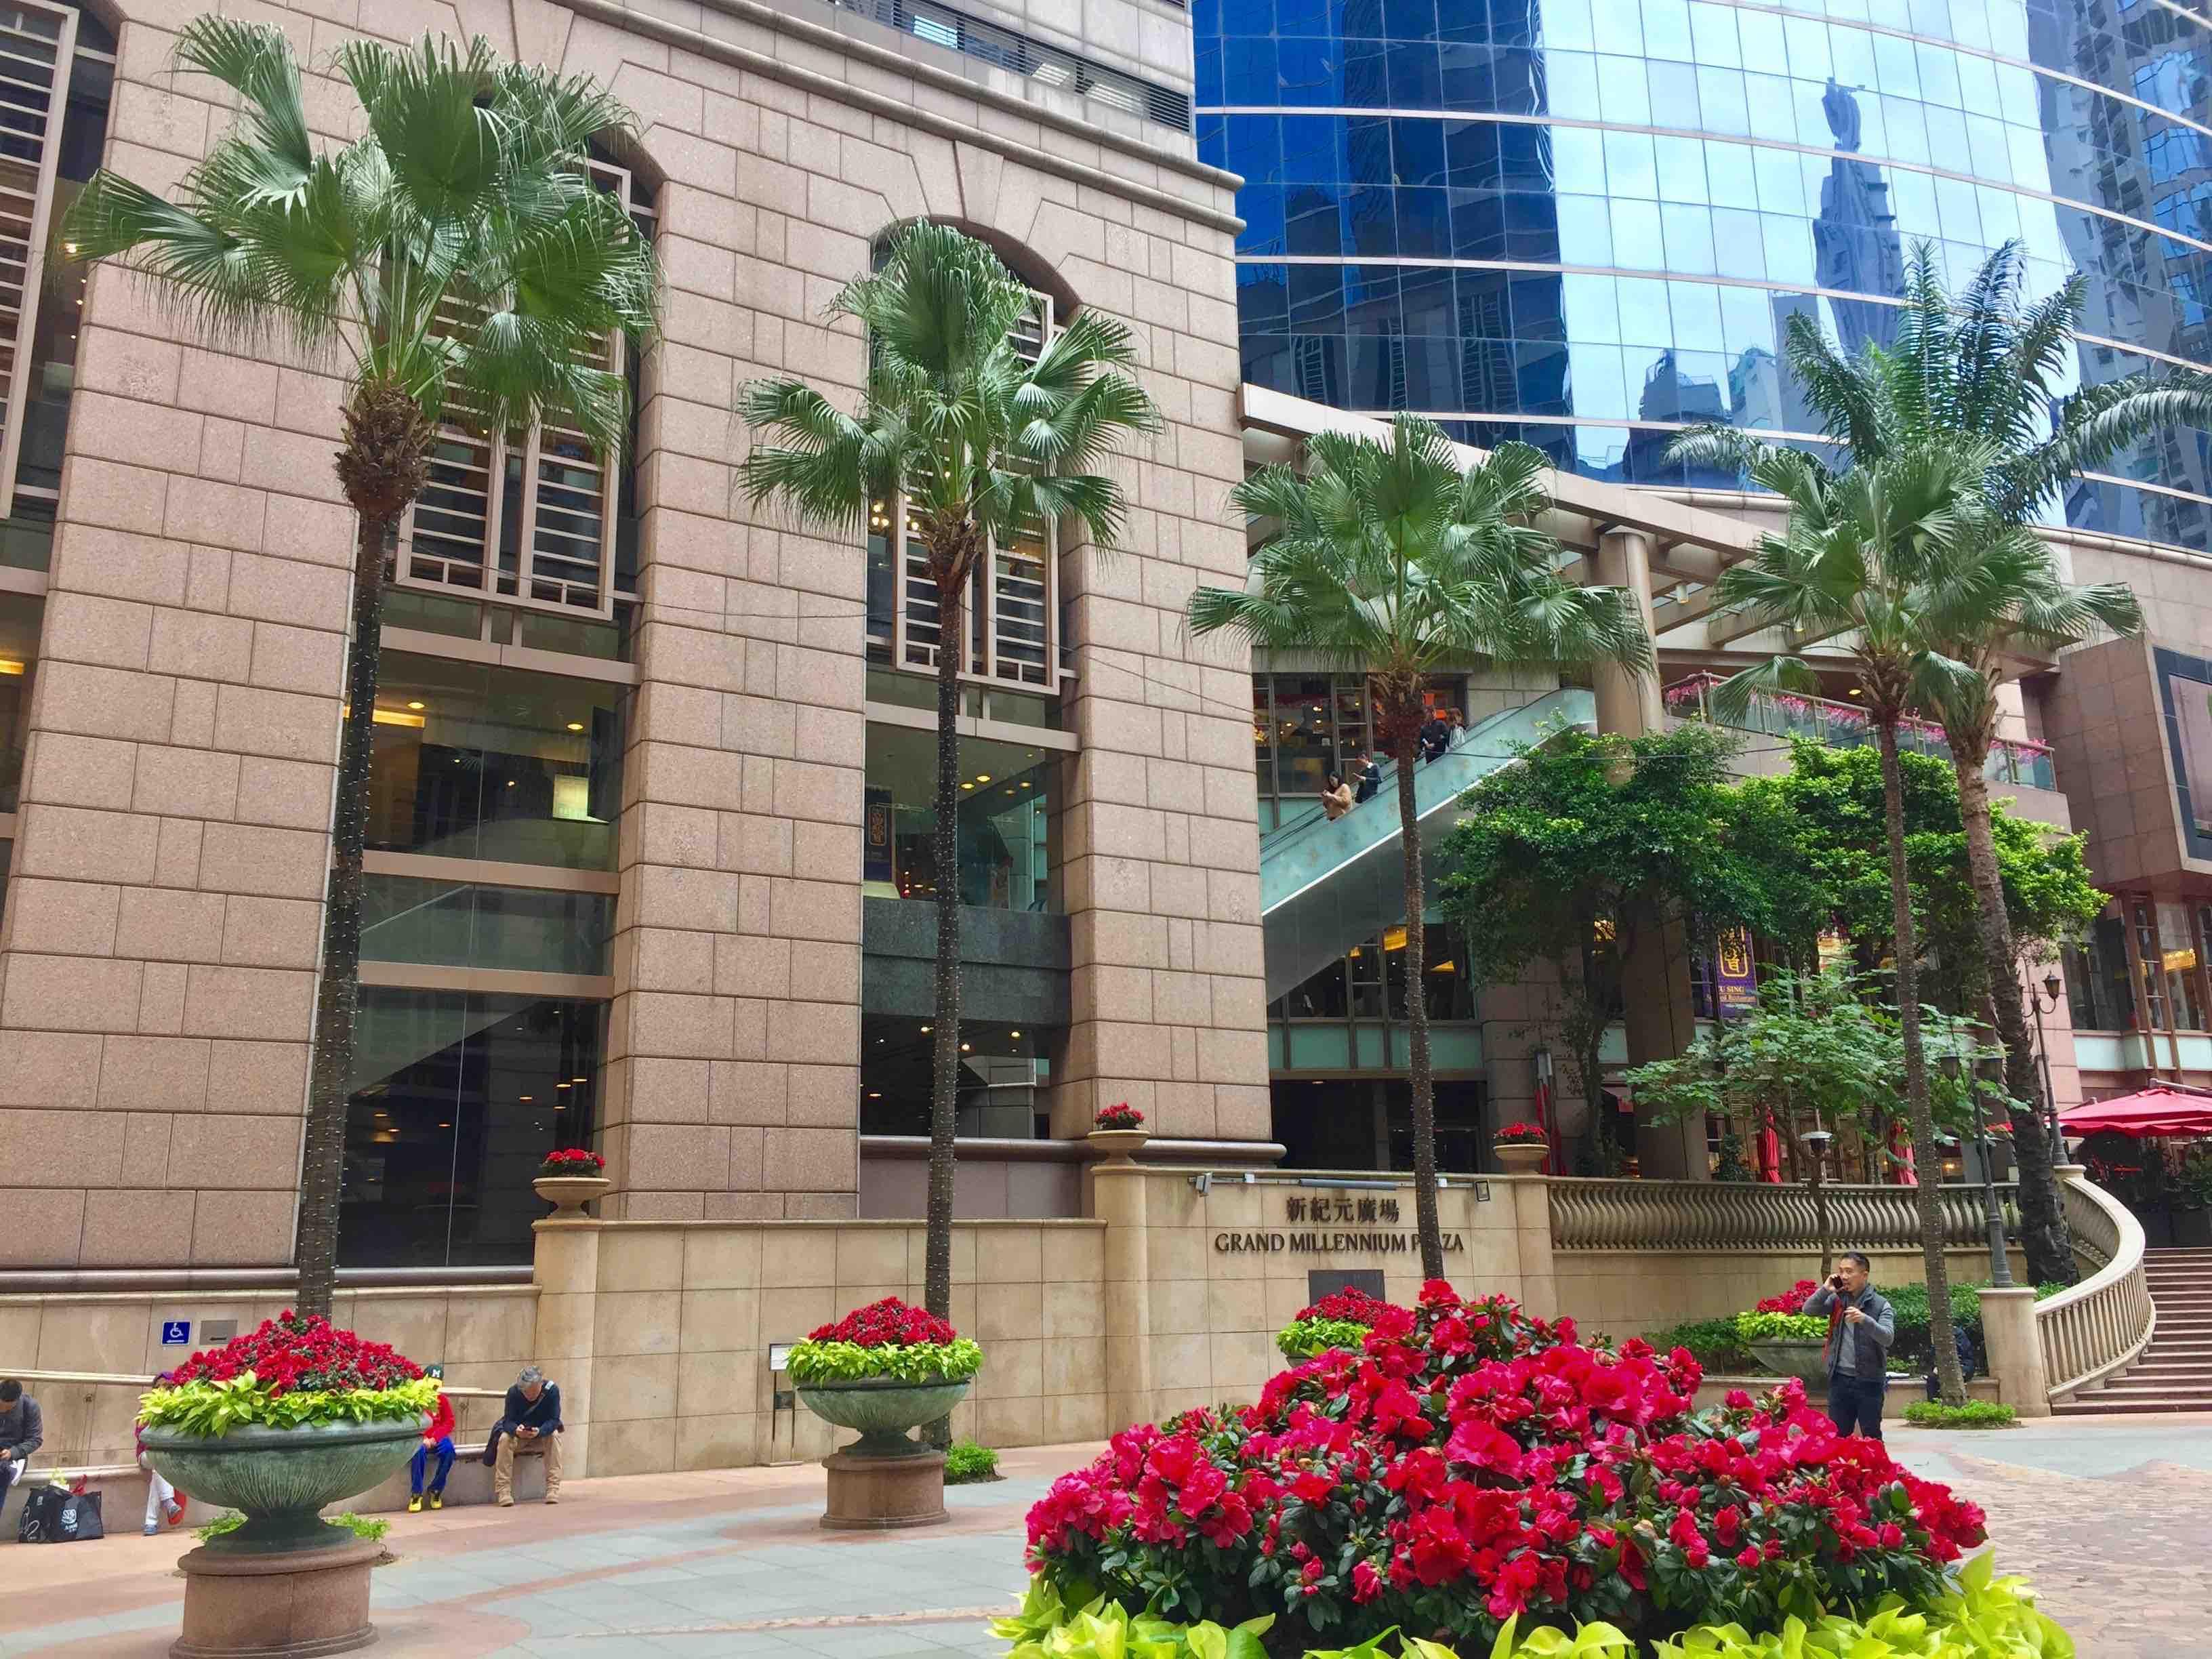 Hong Kong Sheung Wan Office Lobby F&B shop for lease